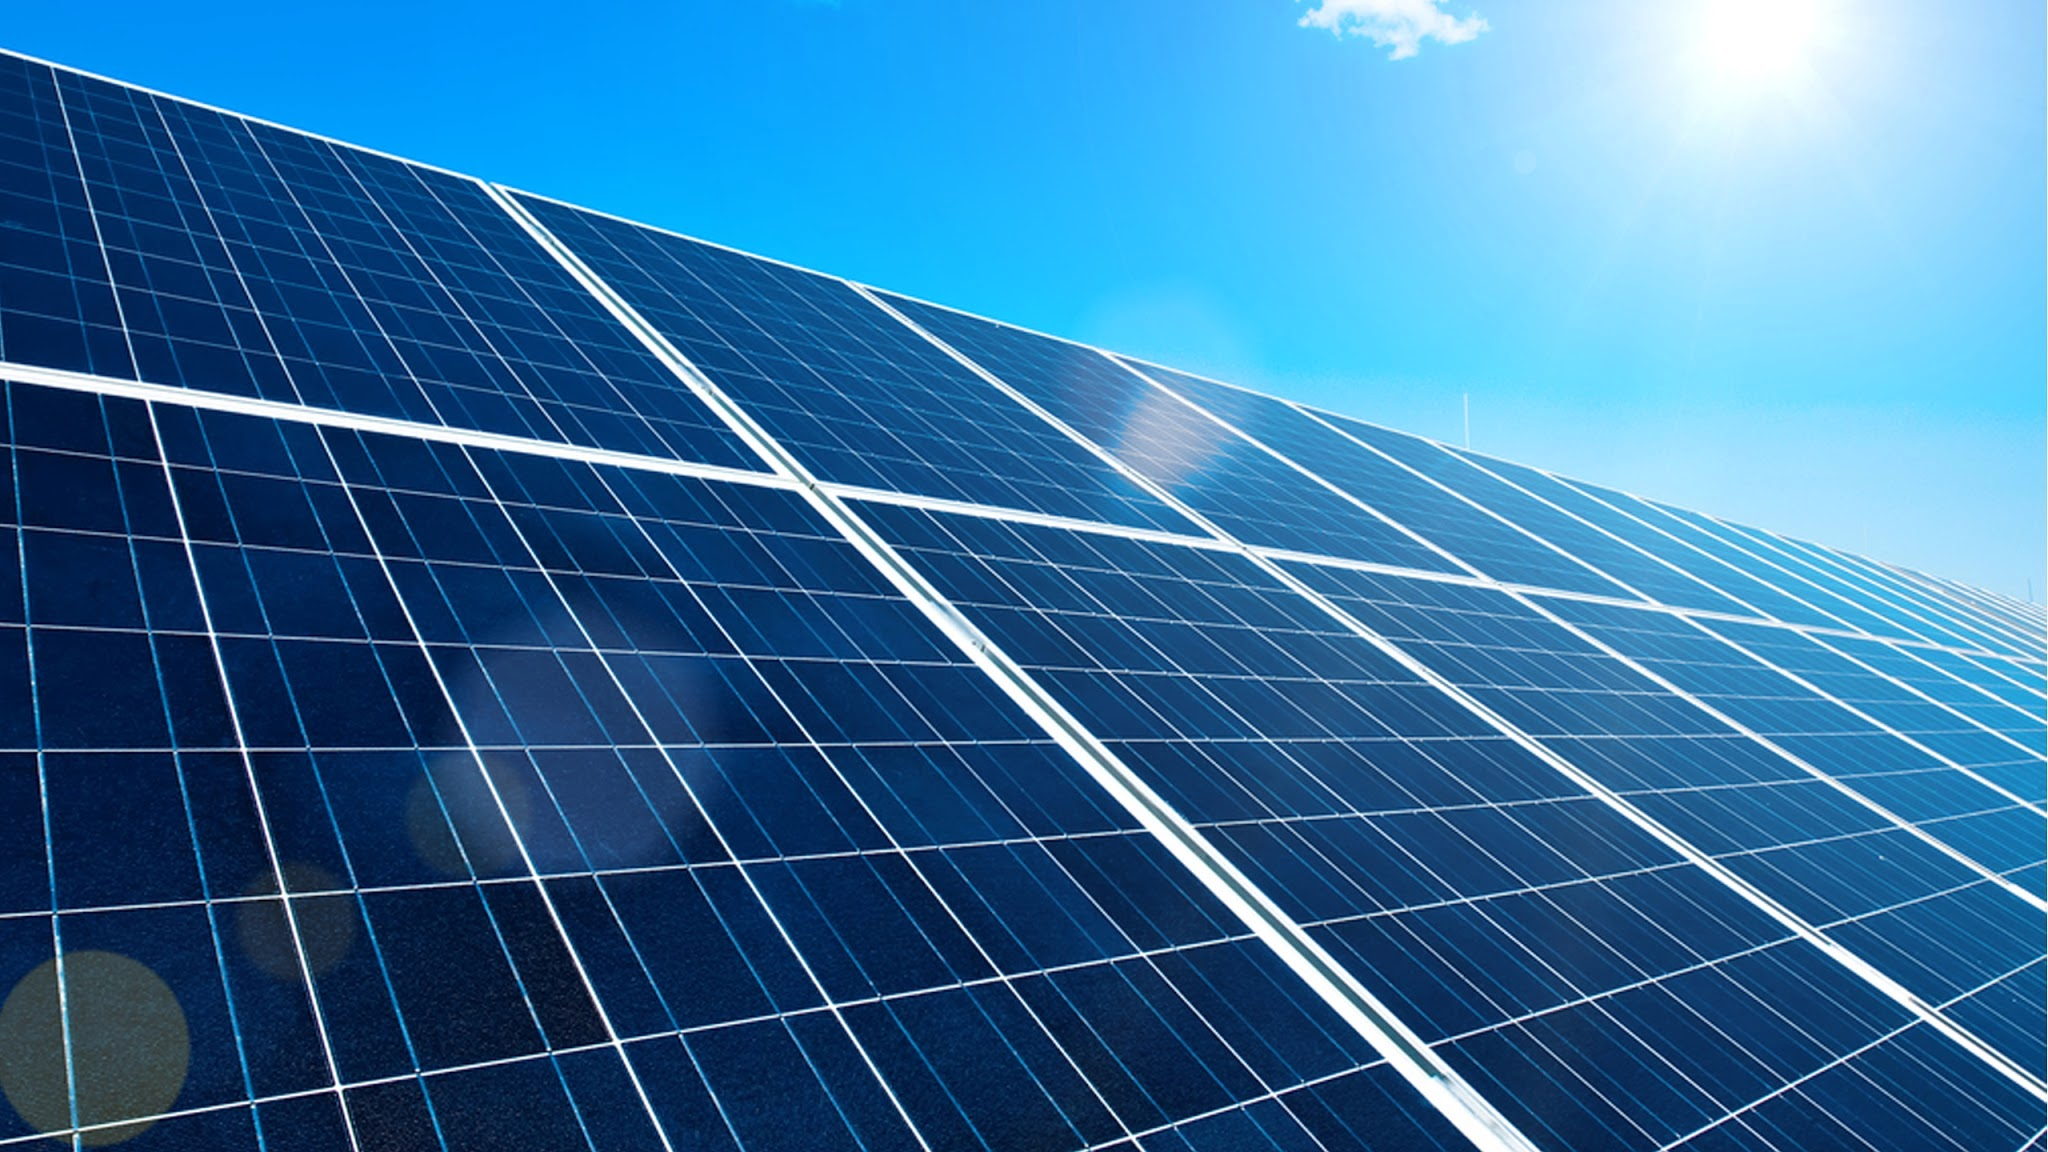 Solar Panels Wallpaper